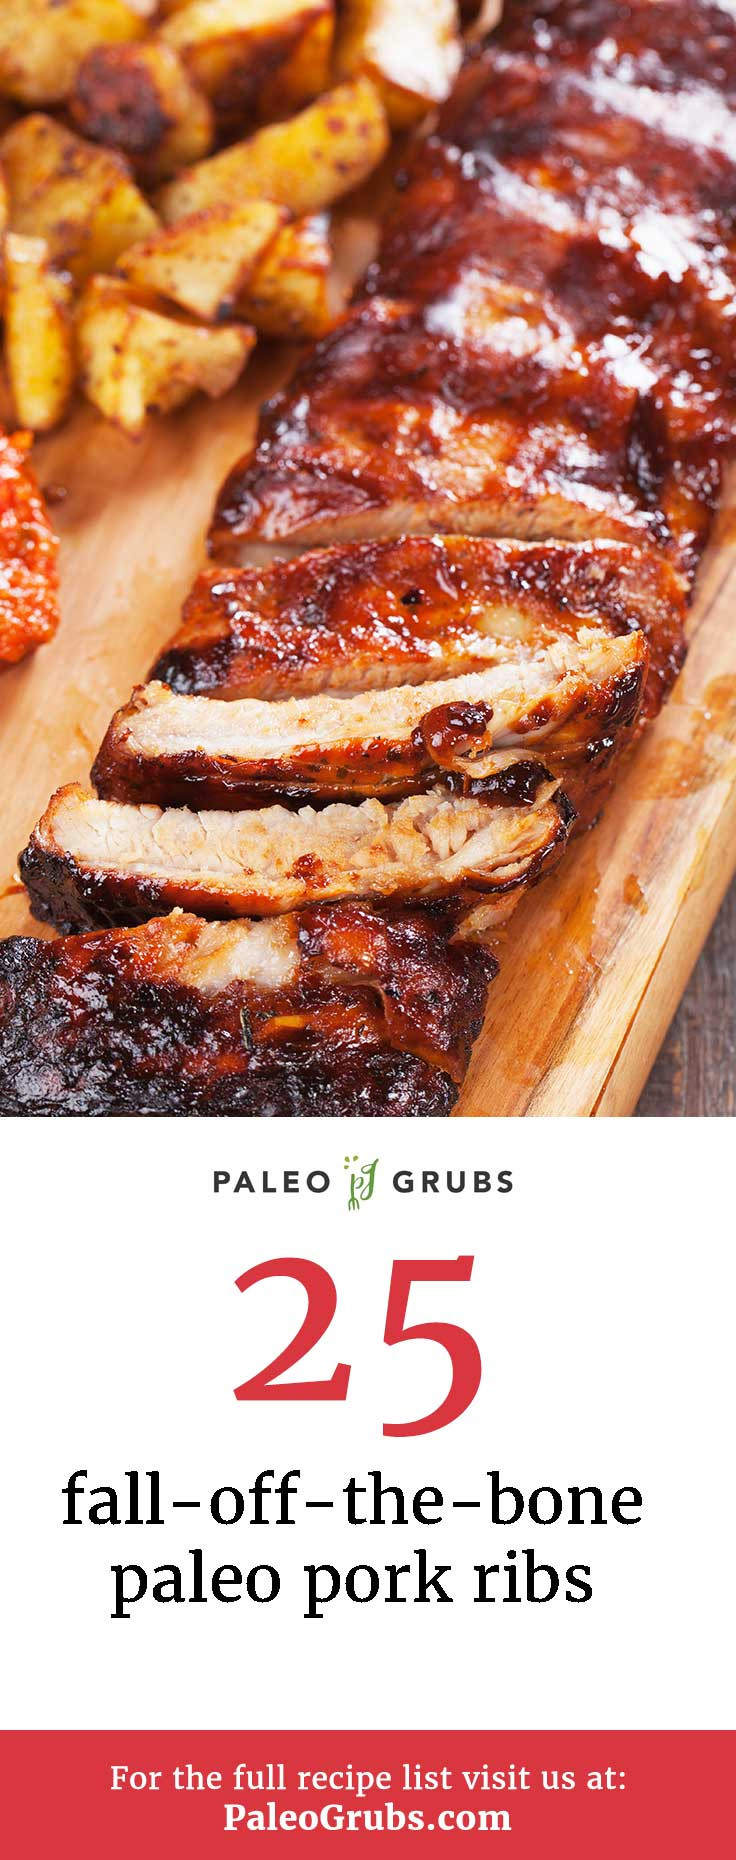 Pork Ribs Recipe  25 Fall f The Bone Paleo Pork Ribs Yummy